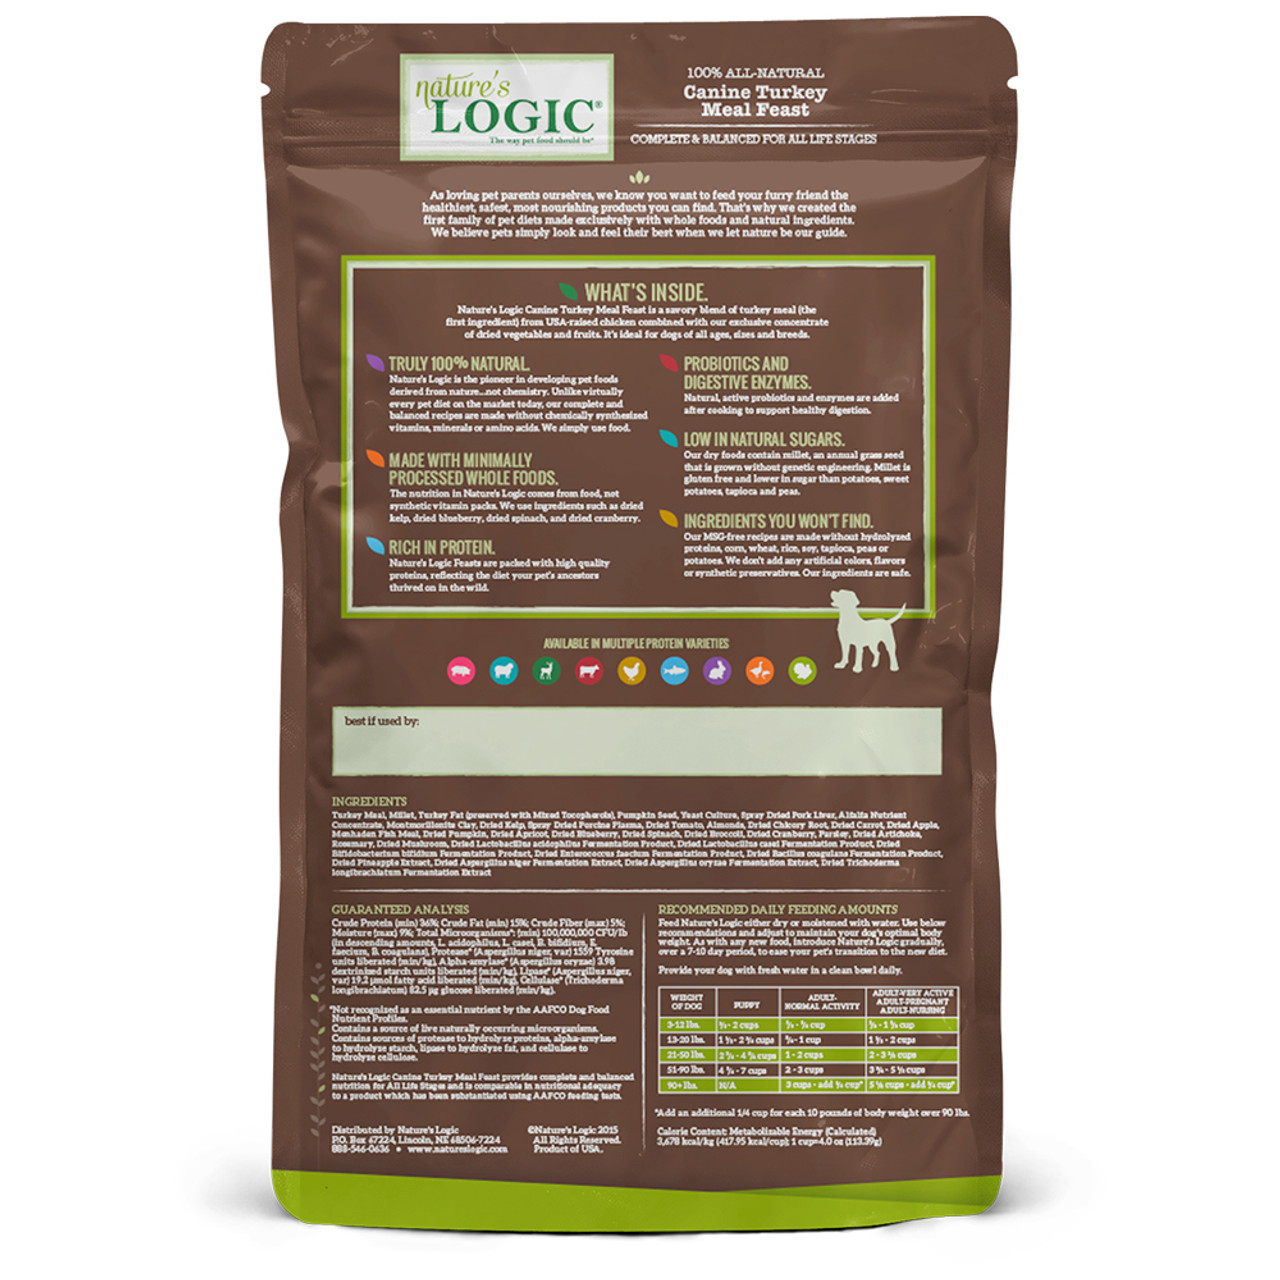 Nature's Logic Canine Turkey Meal Feast Dry Dog Food